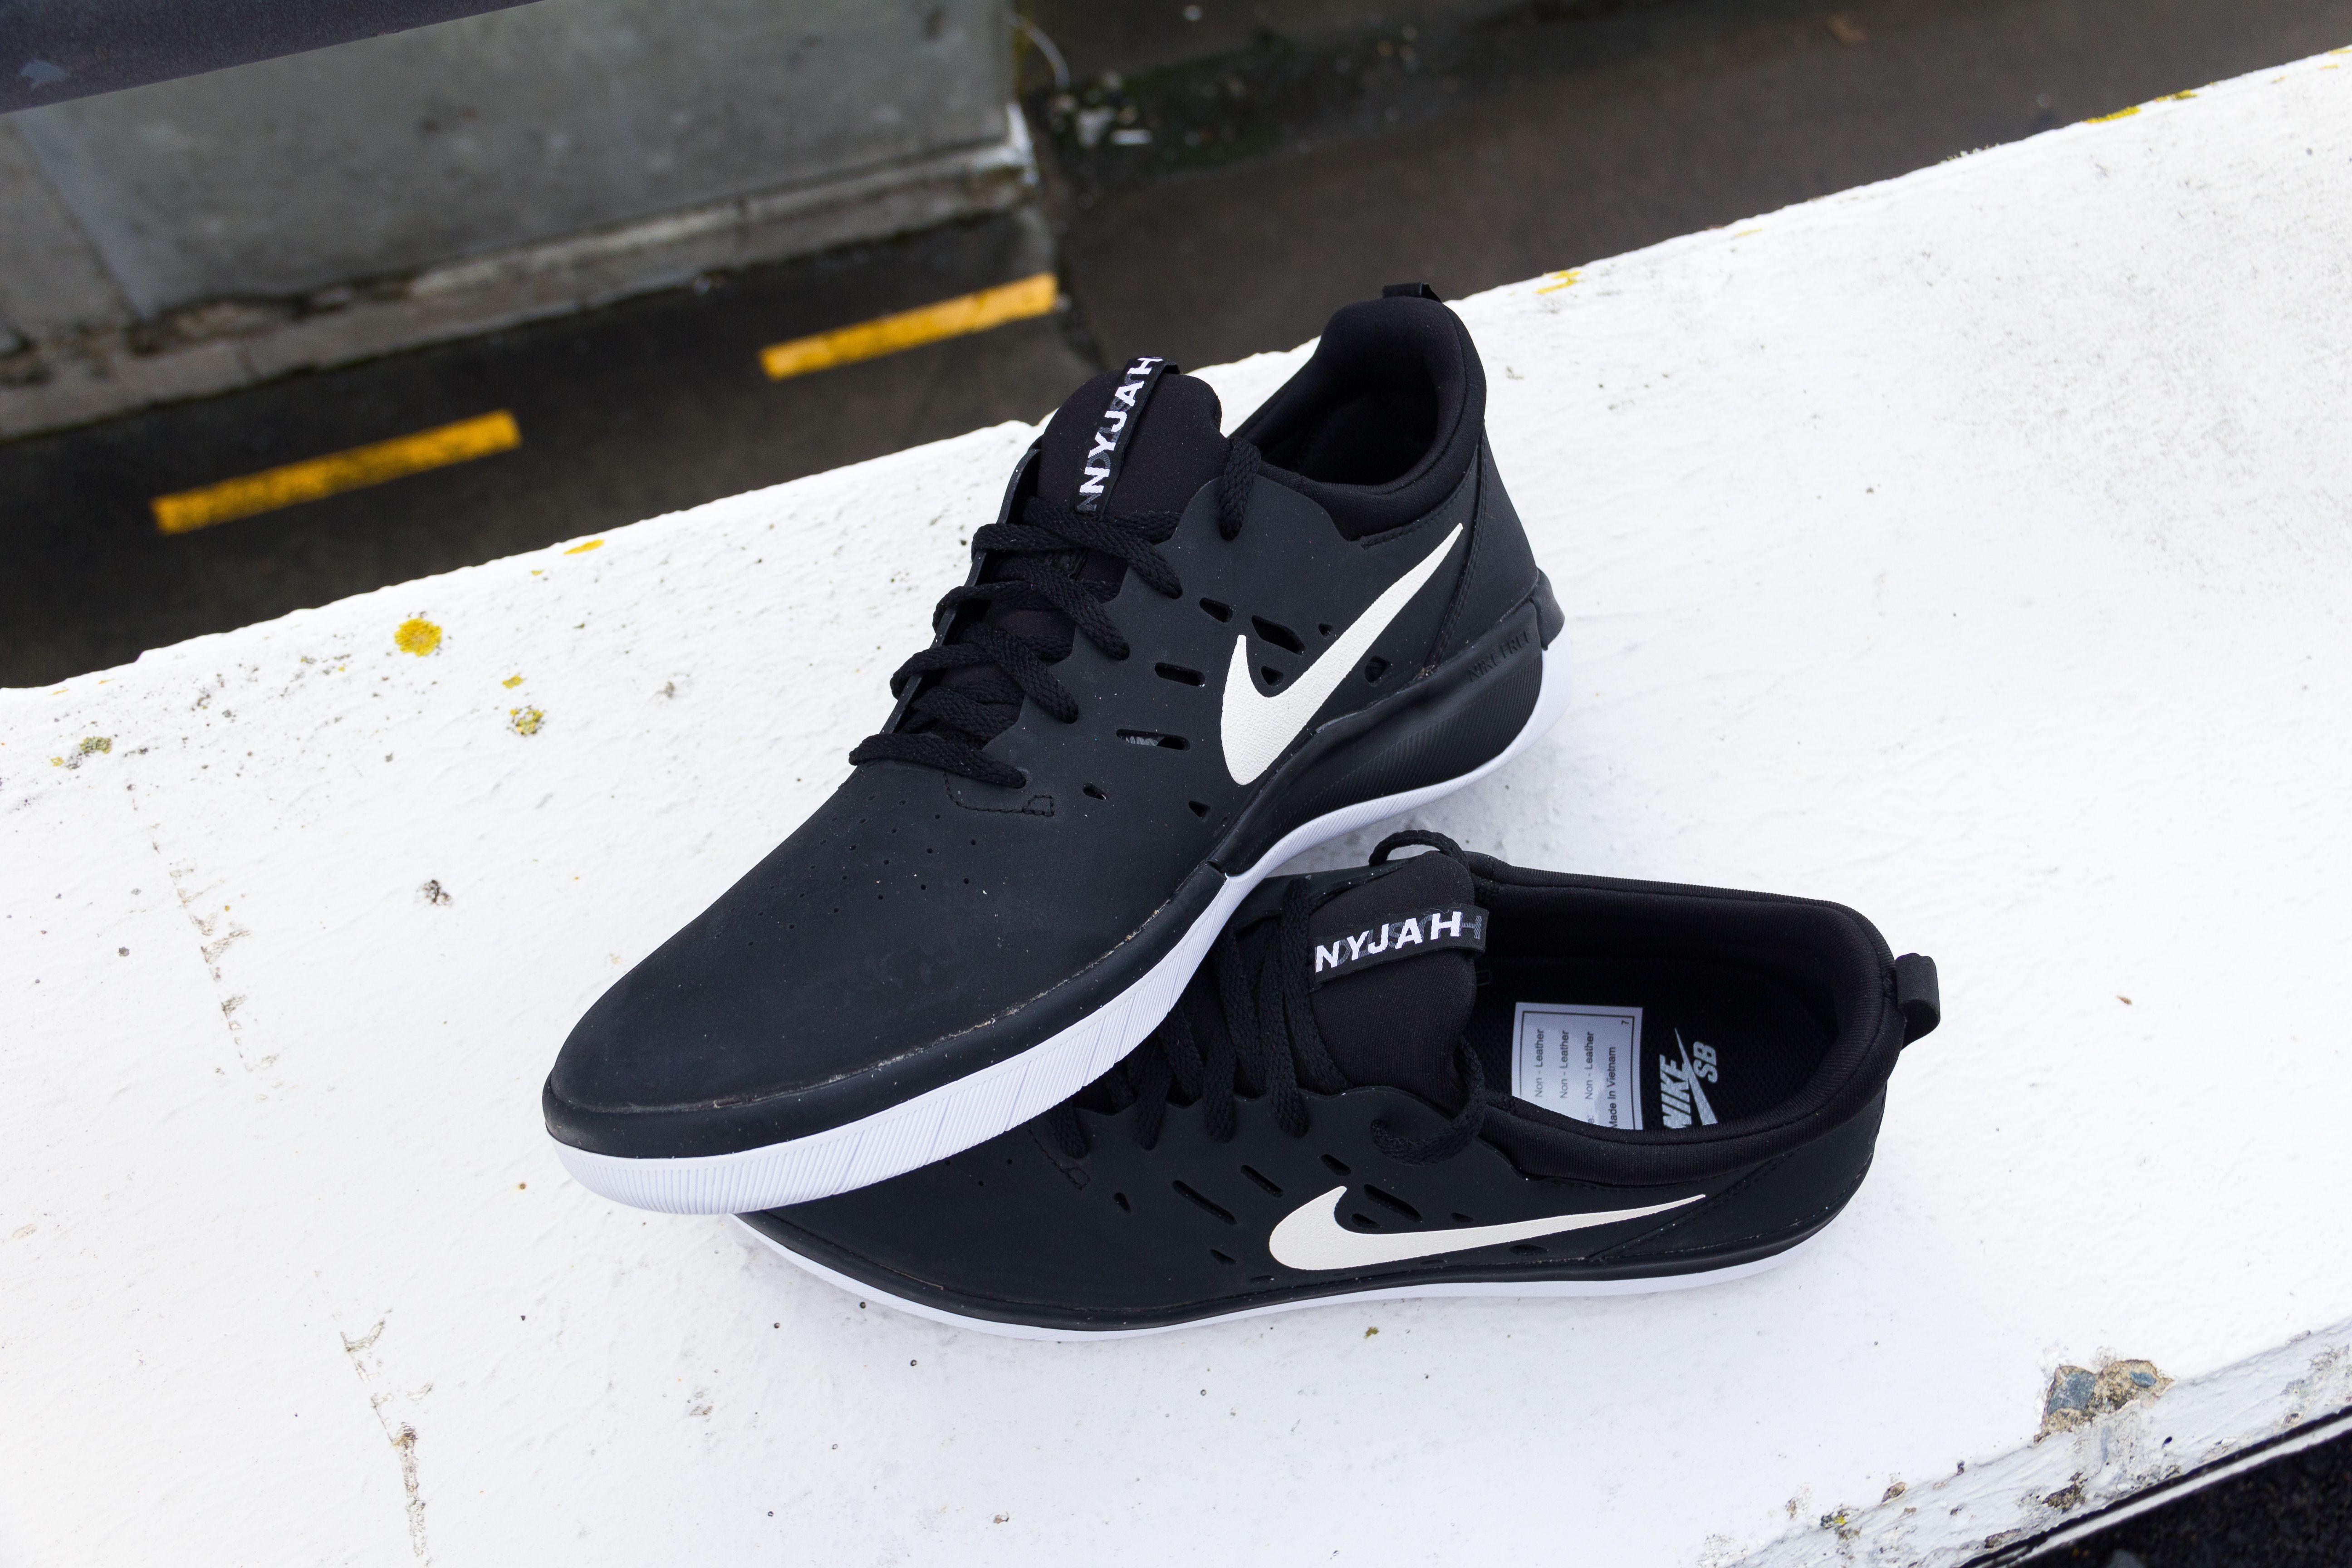 Nike SB Nyjah Free Black Shoe  dcf3dcdff